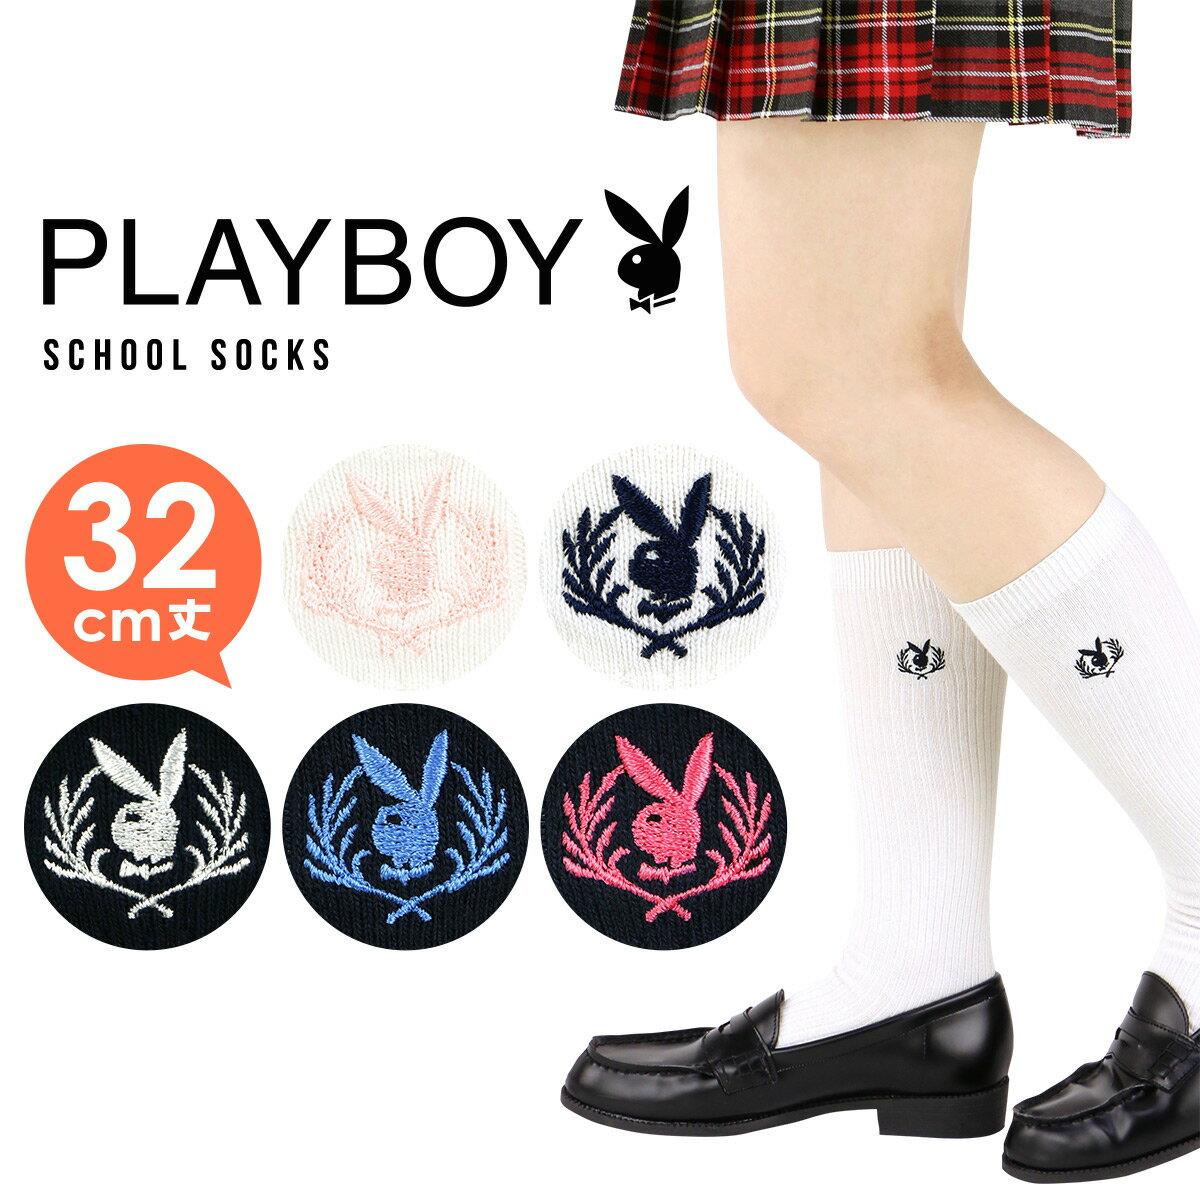 PLAYBOY (プレイボーイ) スクールソックス 32cm丈 スクールソックスエンブレムロゴ レディス ハイソックス 靴下 3737-692ポイント10倍